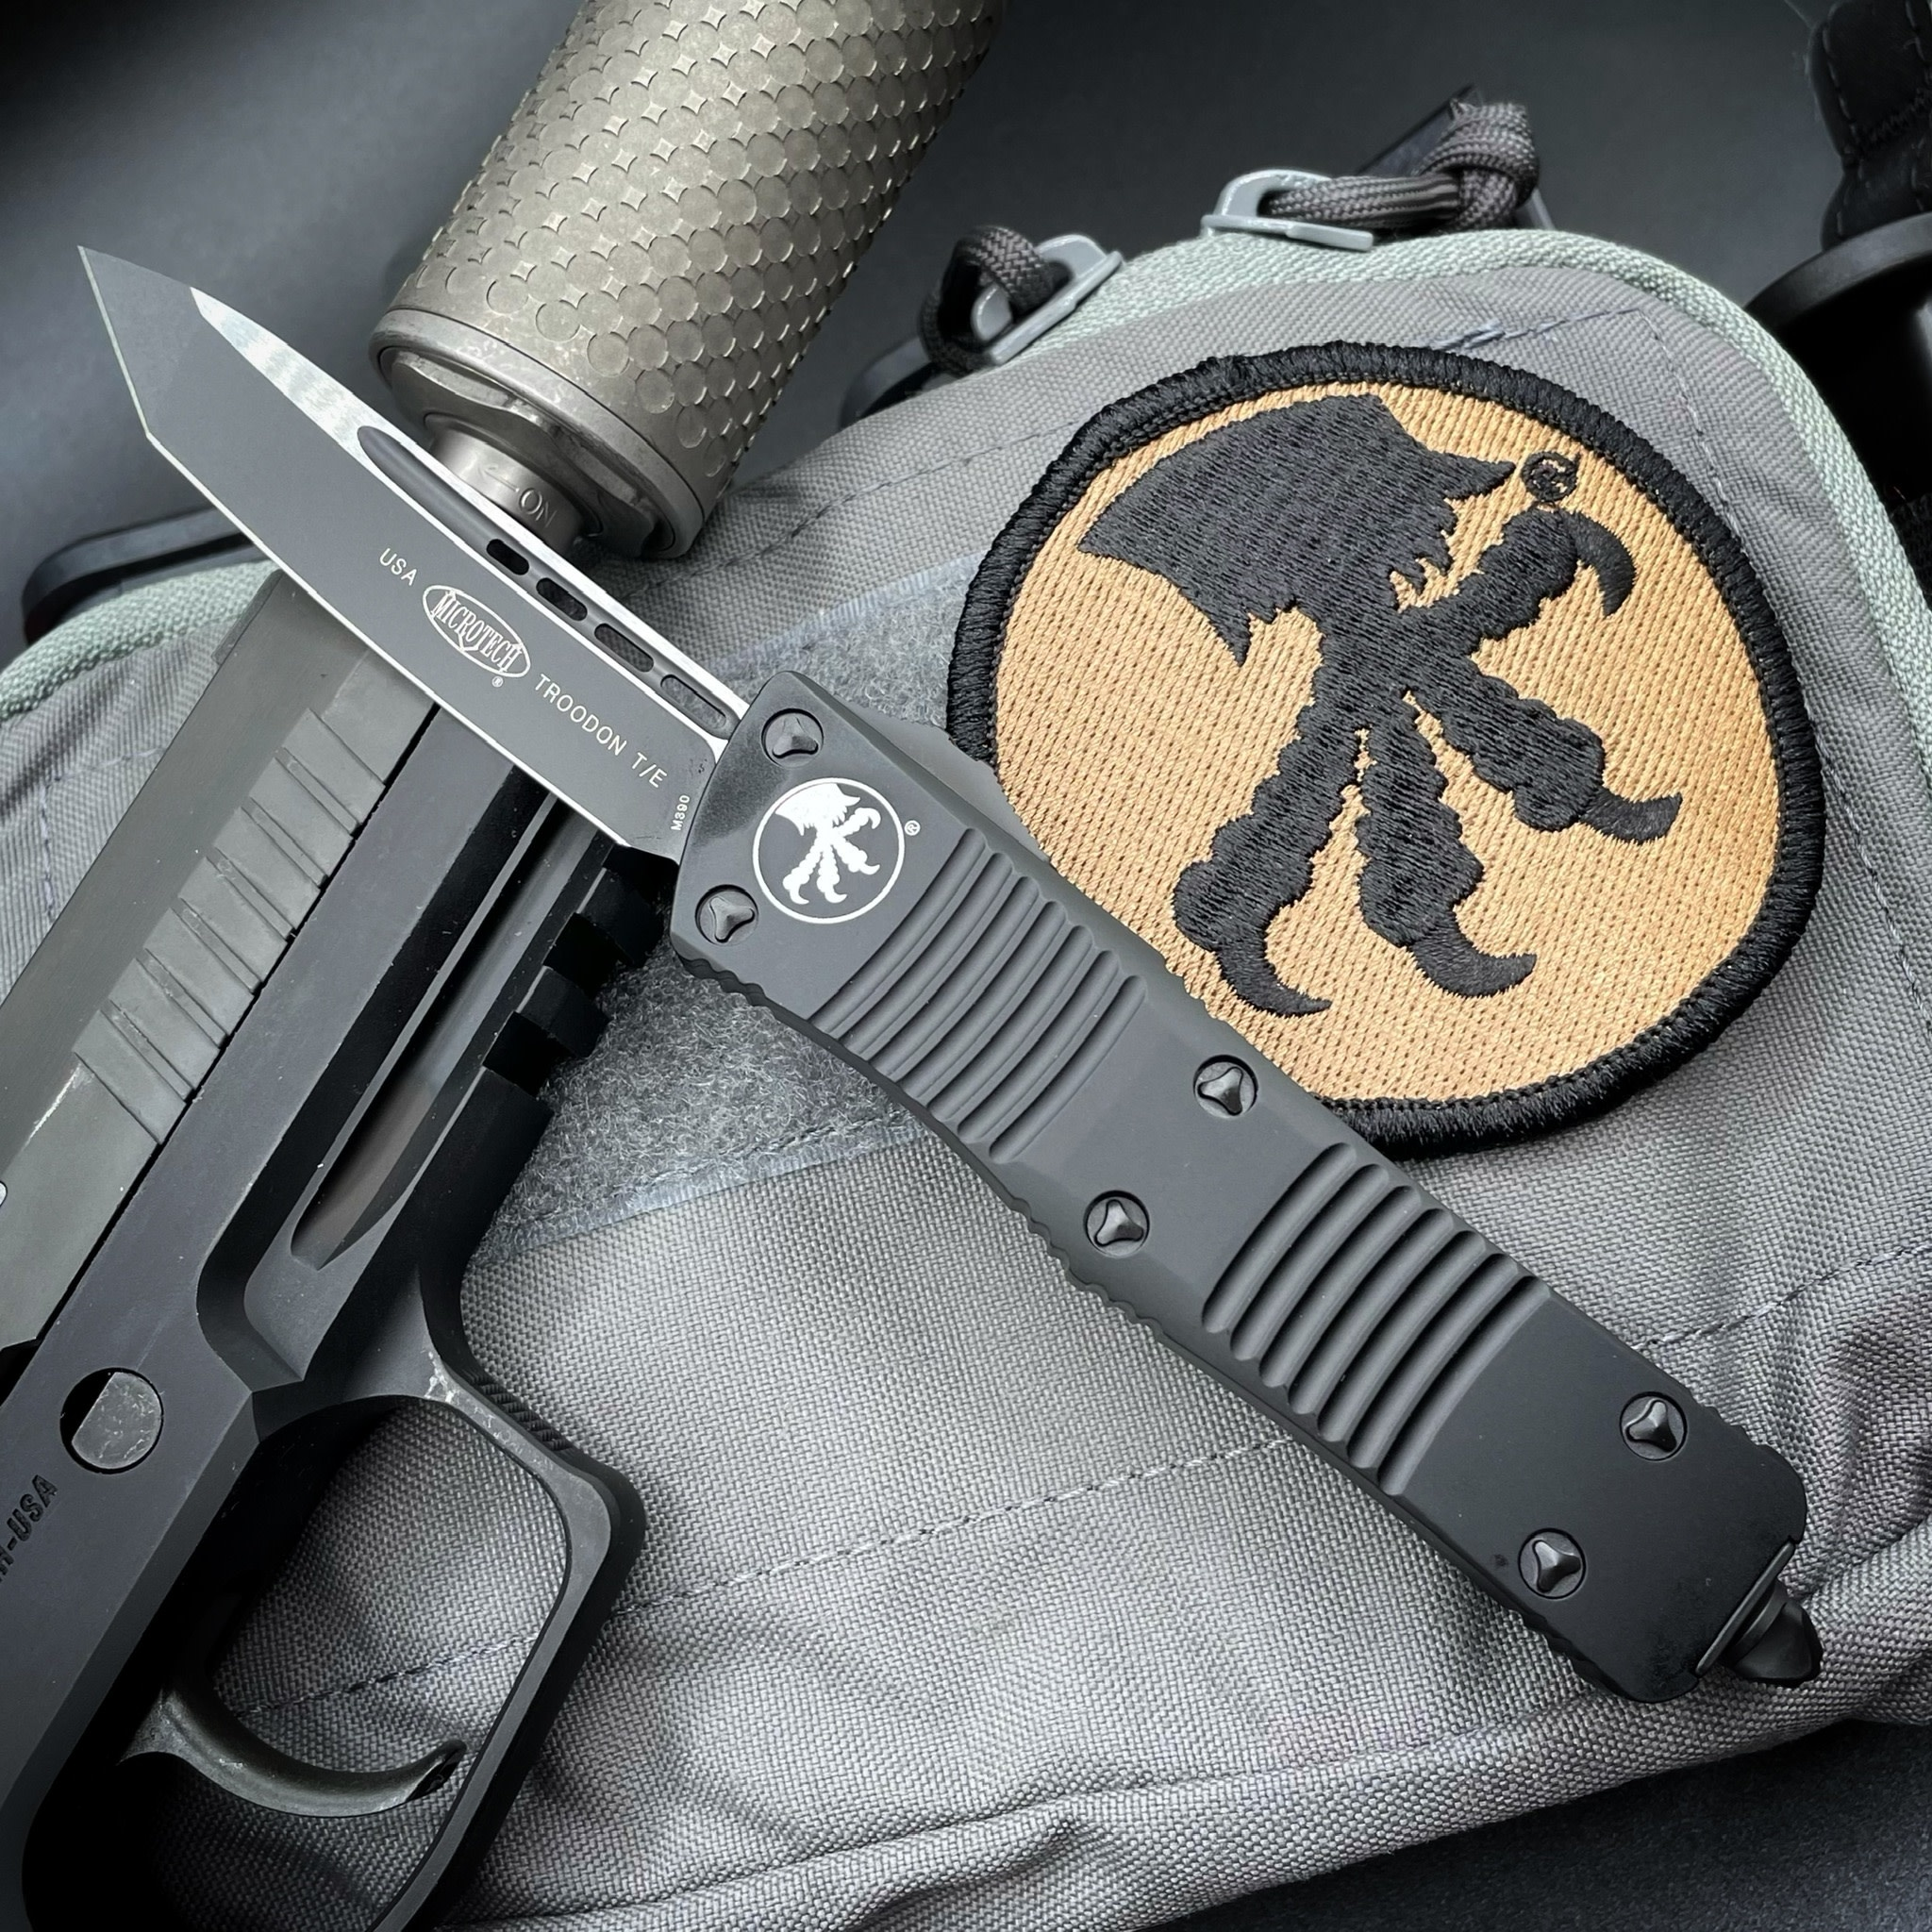 Microtech TROODON, black tactical, blade - single edge, standard